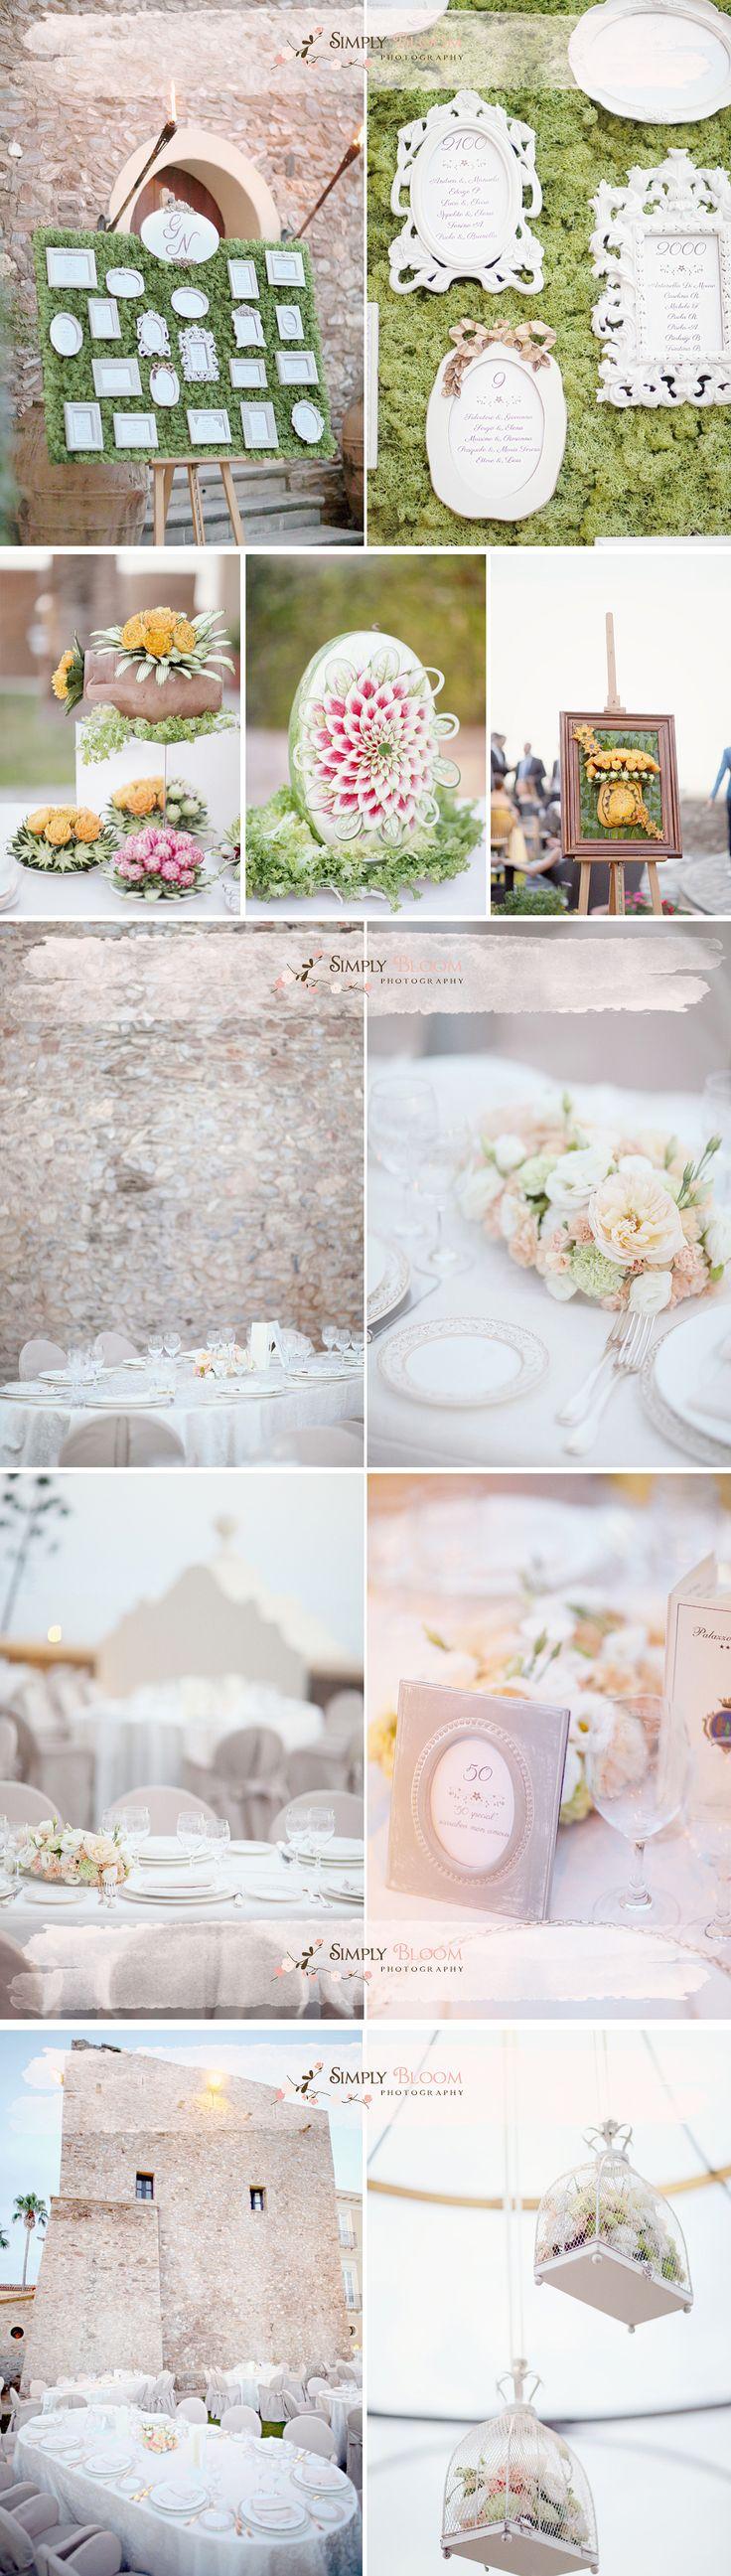 471 best chateau images on Pinterest | Wedding places, Wedding ...